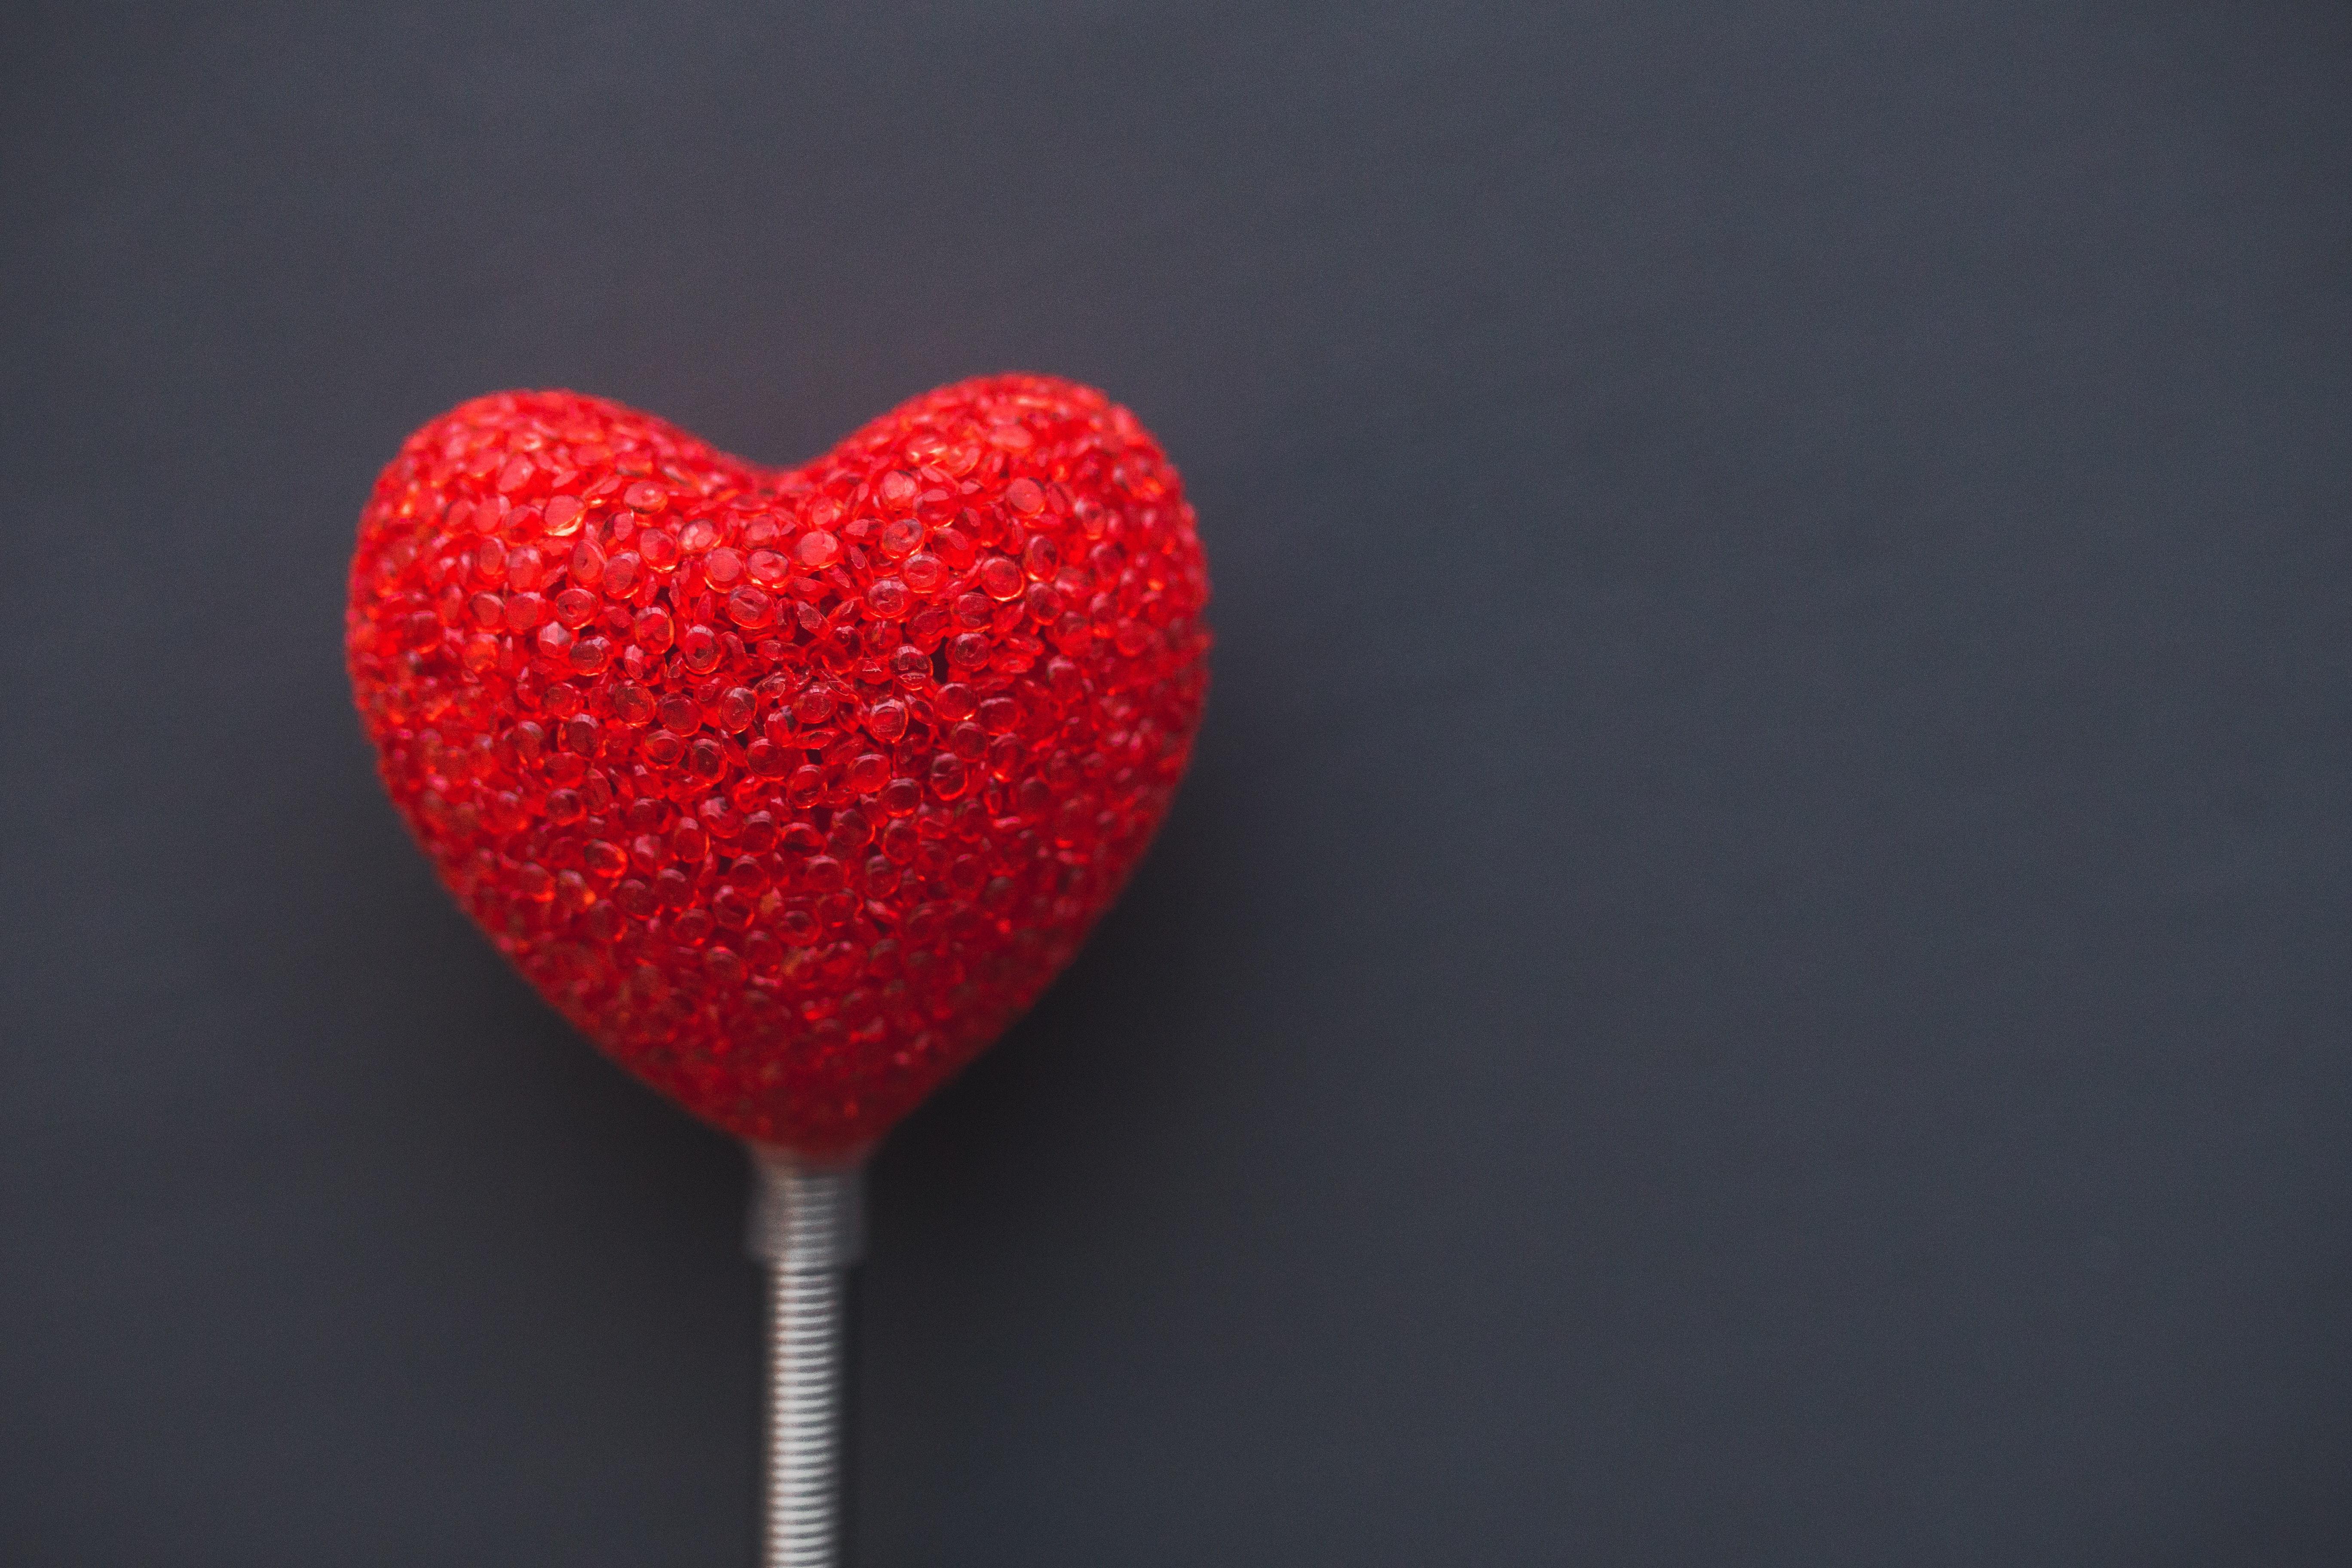 Big Red Heart On Dark Background Free Stock Photo